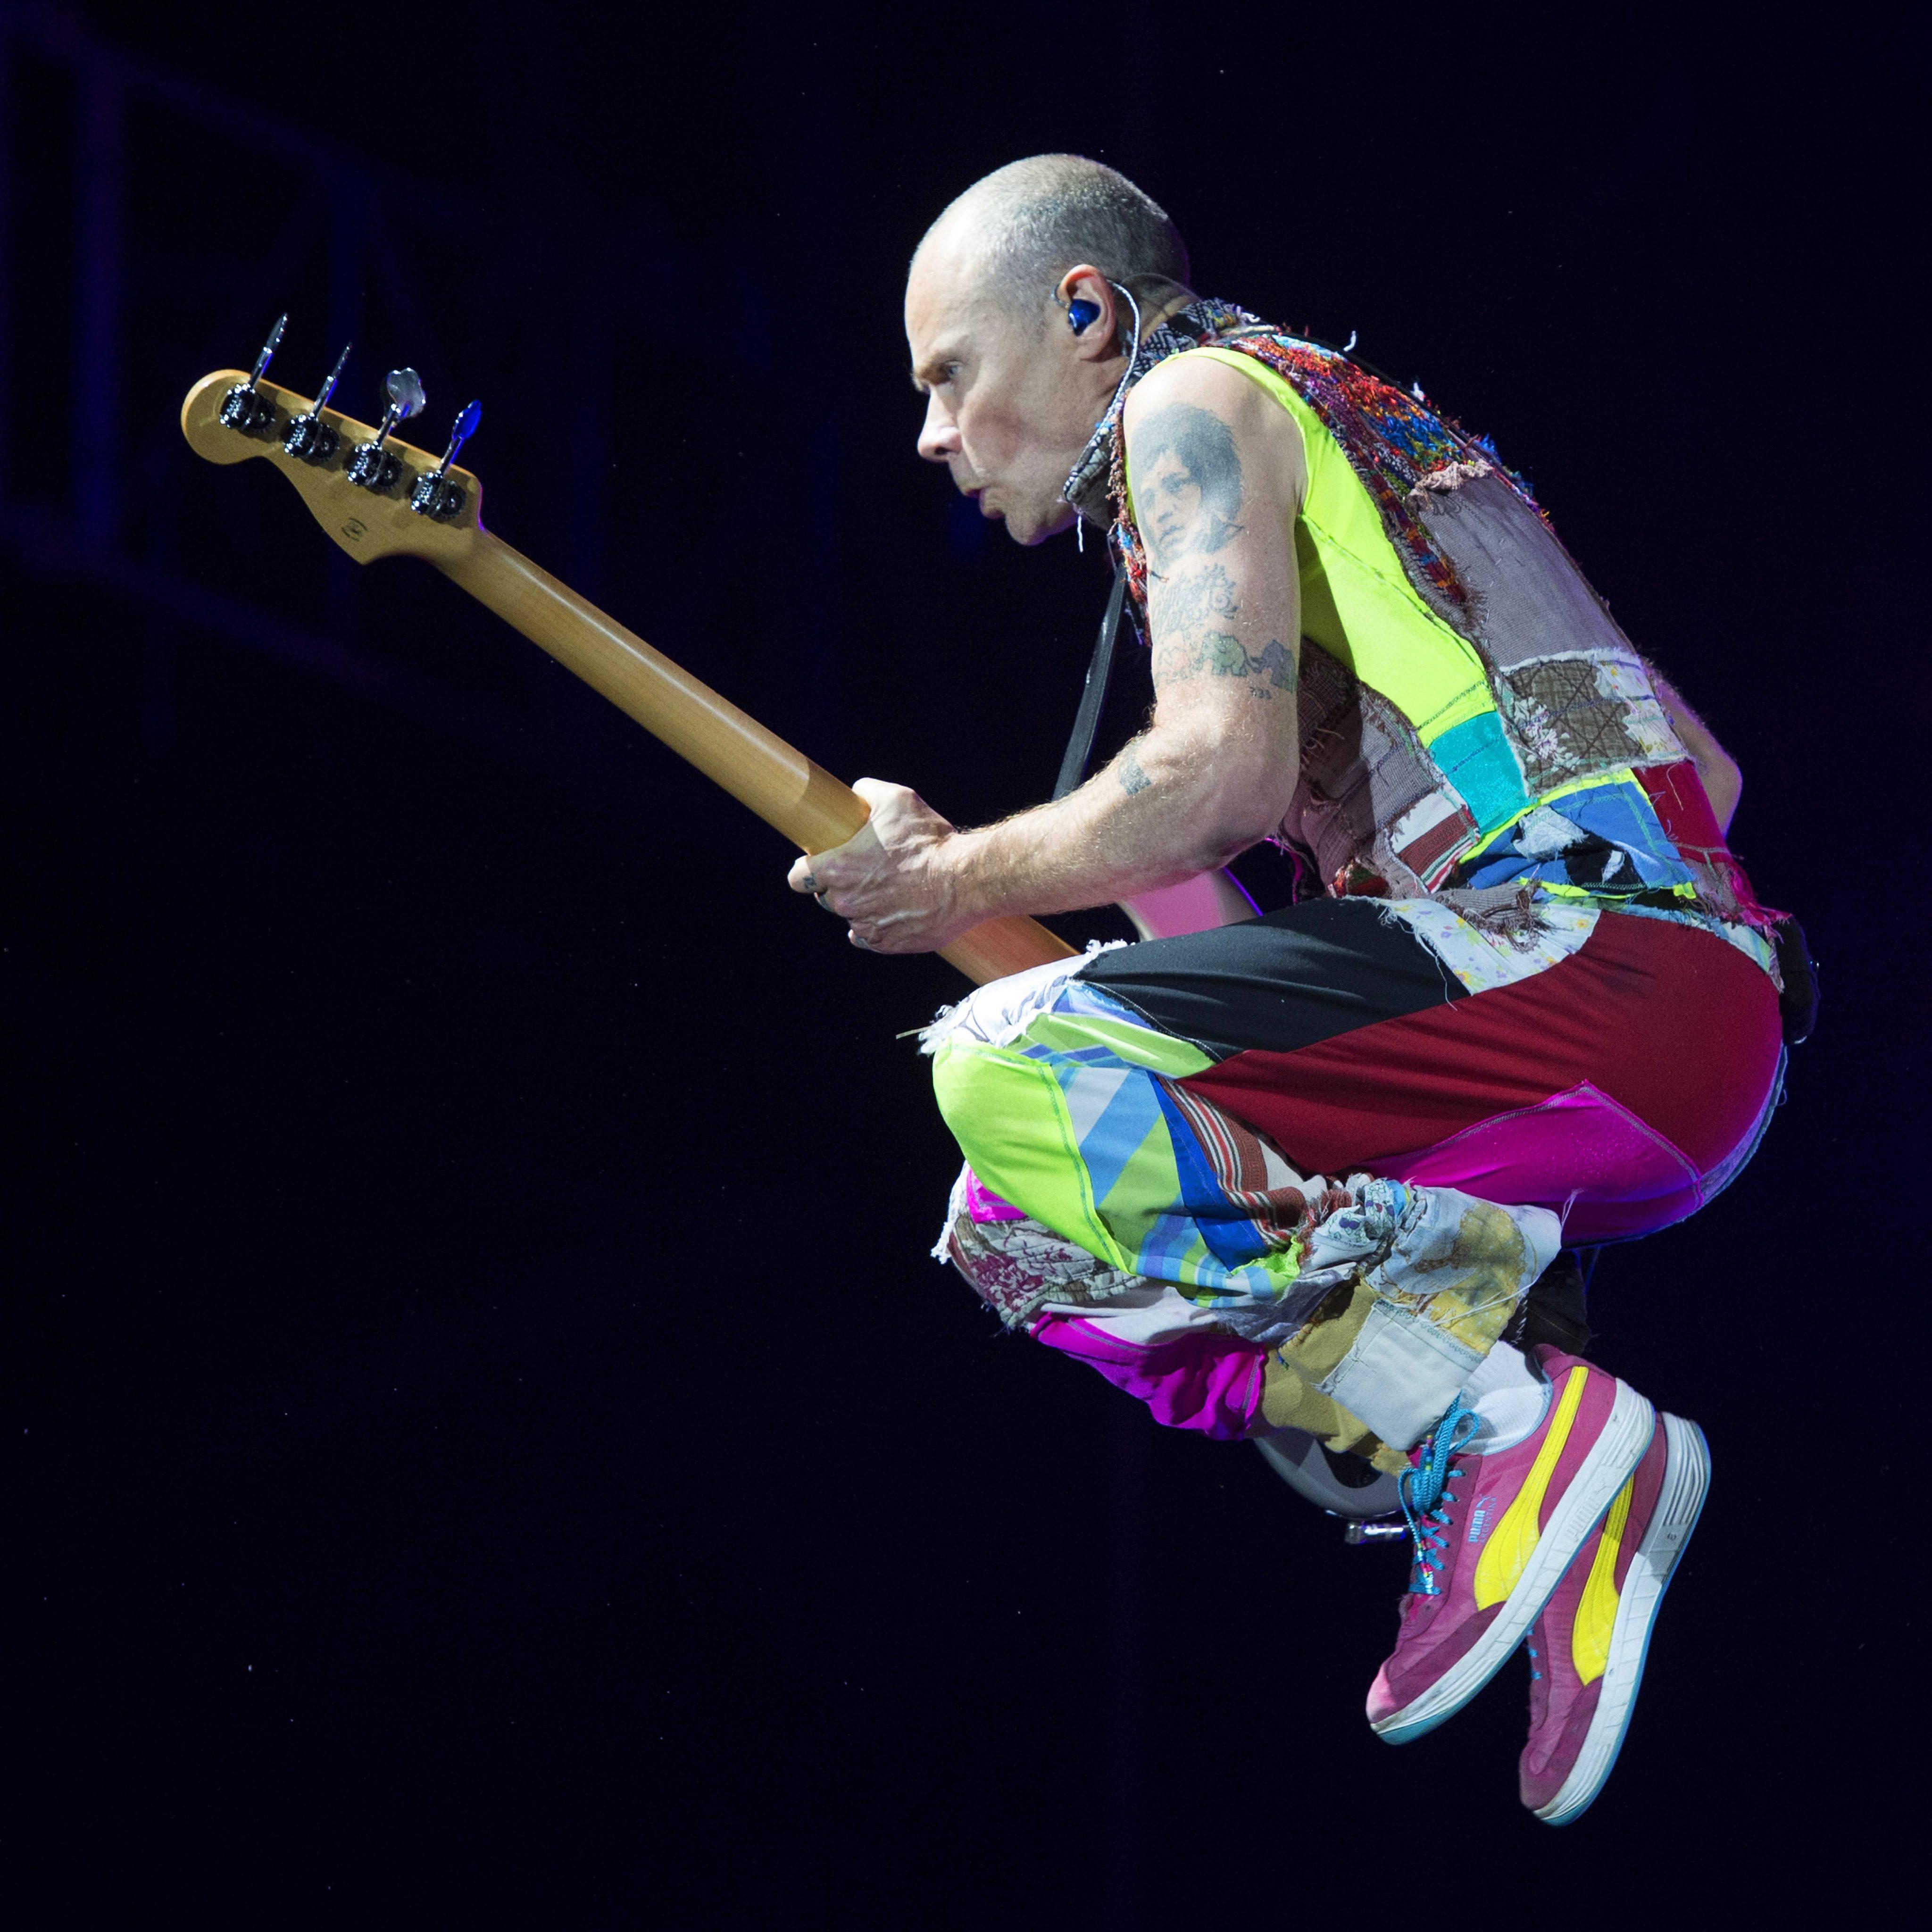 Michael 'Flea' Balzary